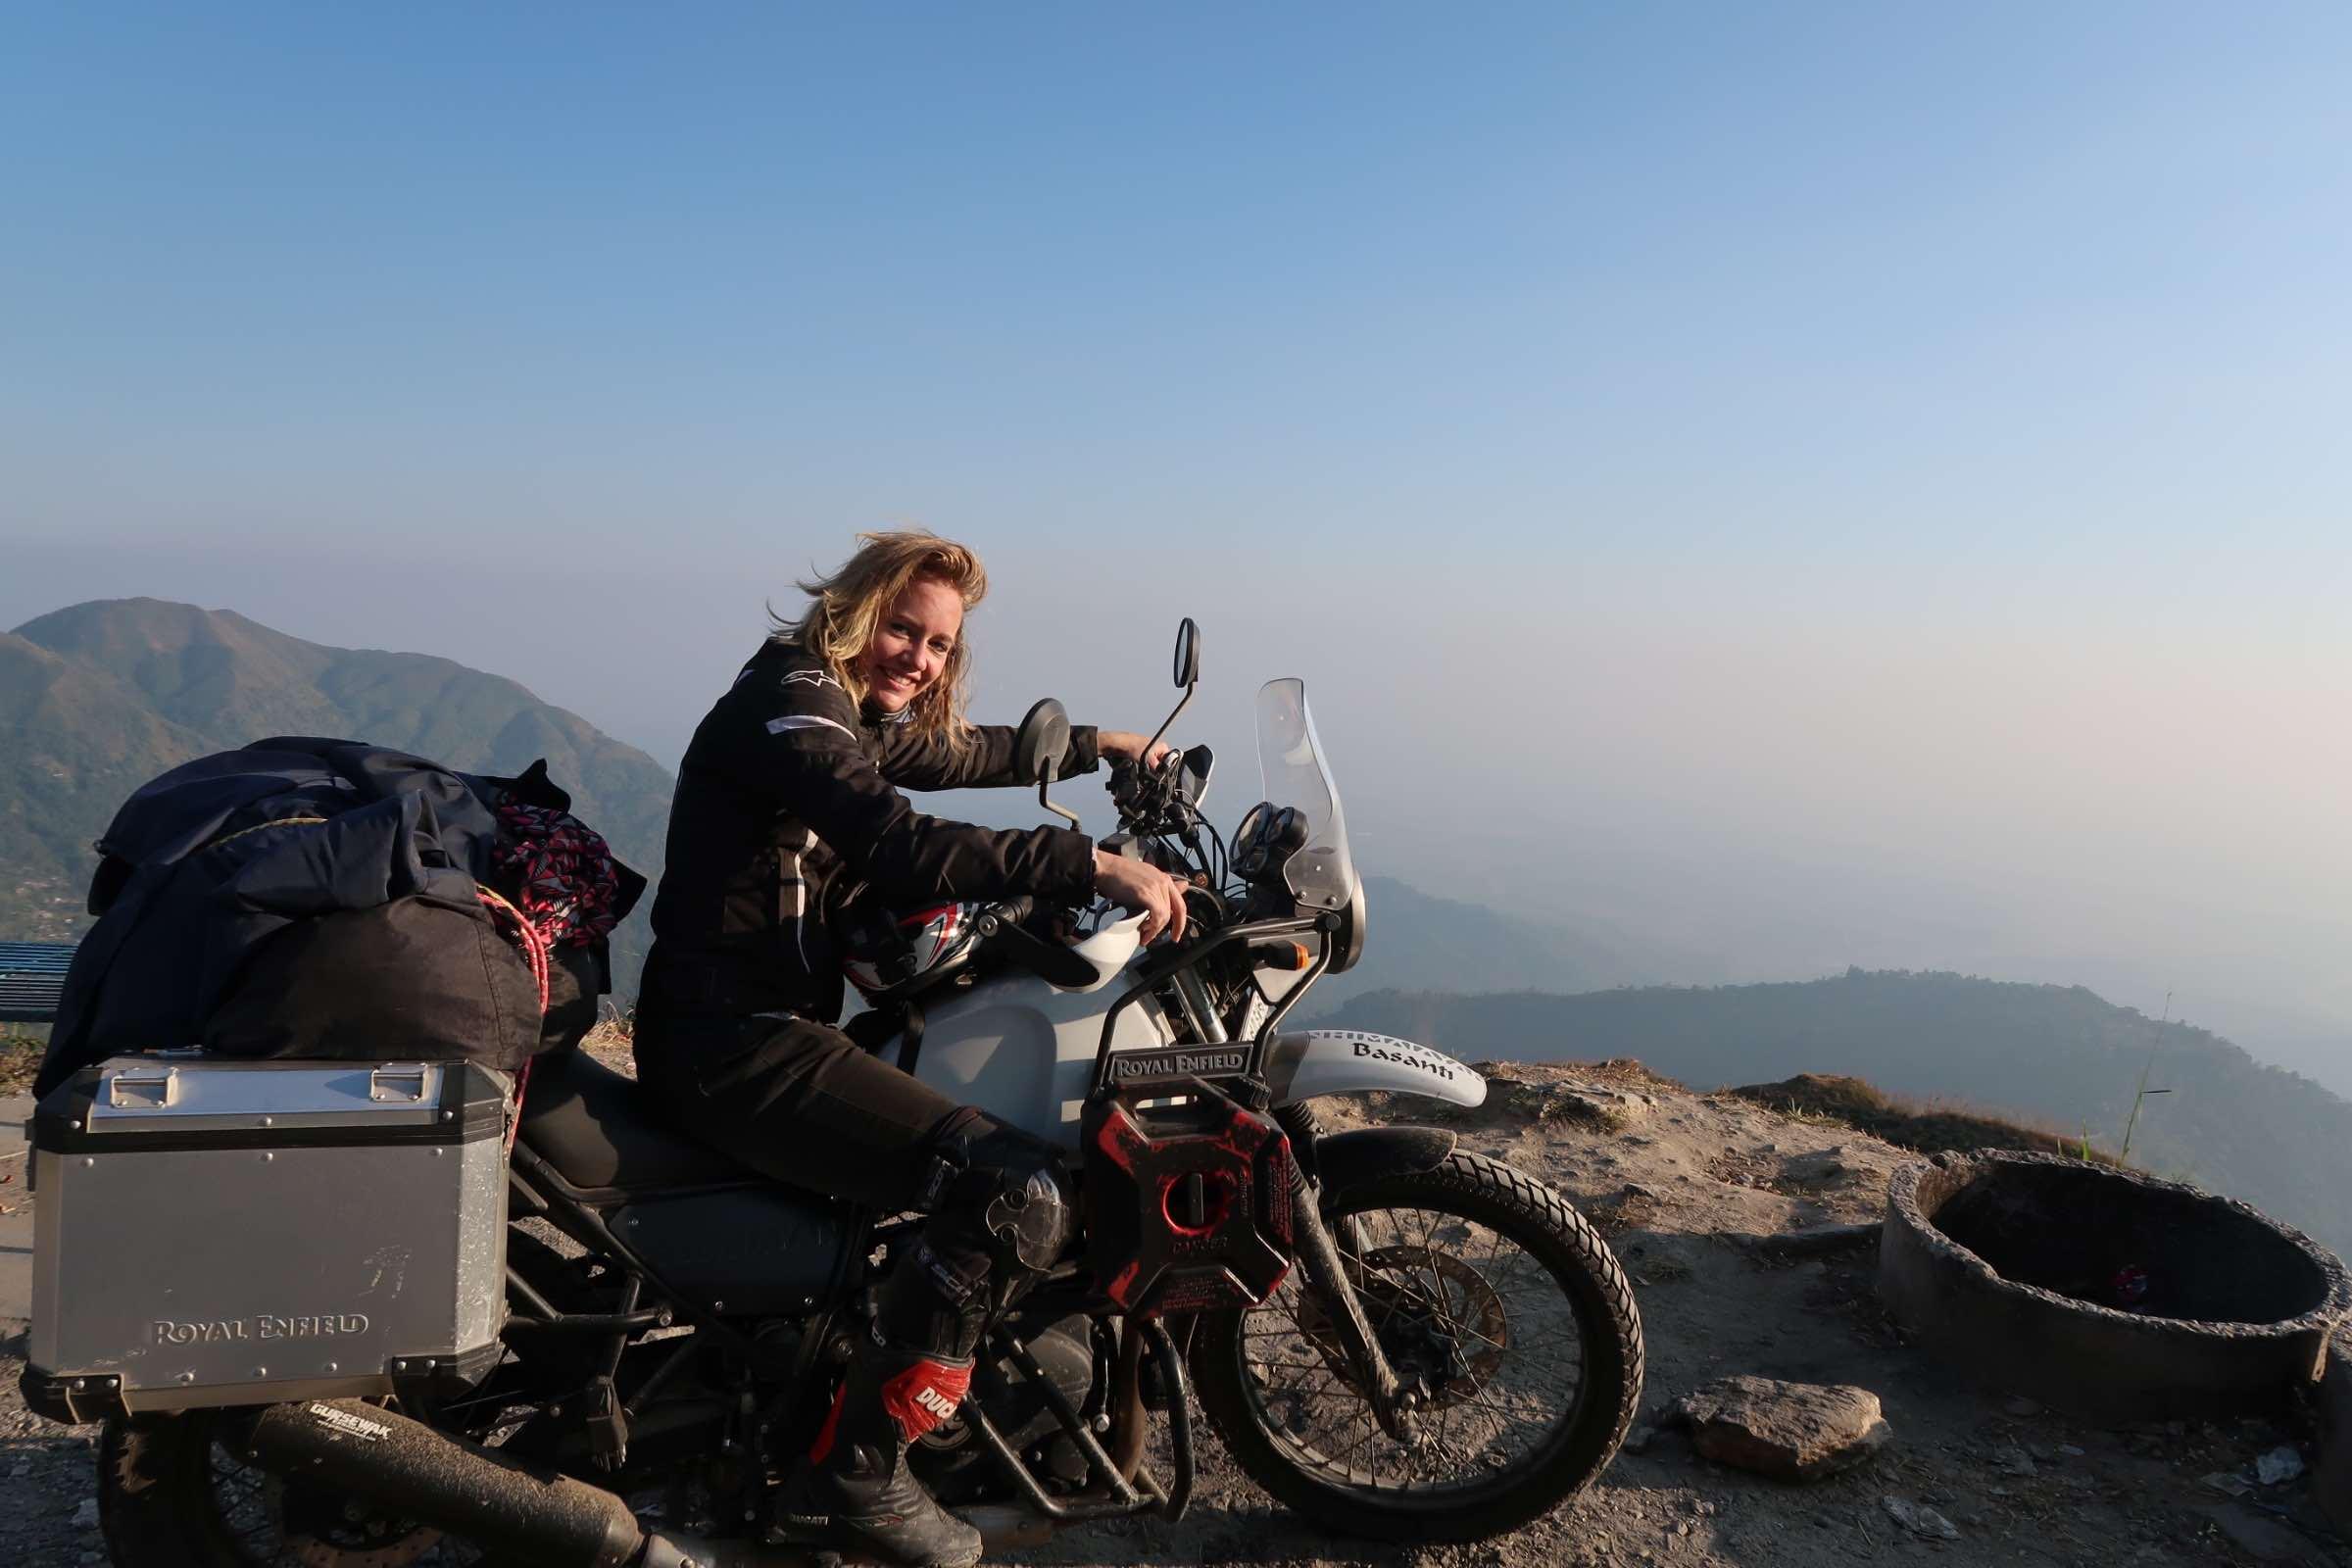 40 Kilometers before darjeeling - when life was still running smoothly